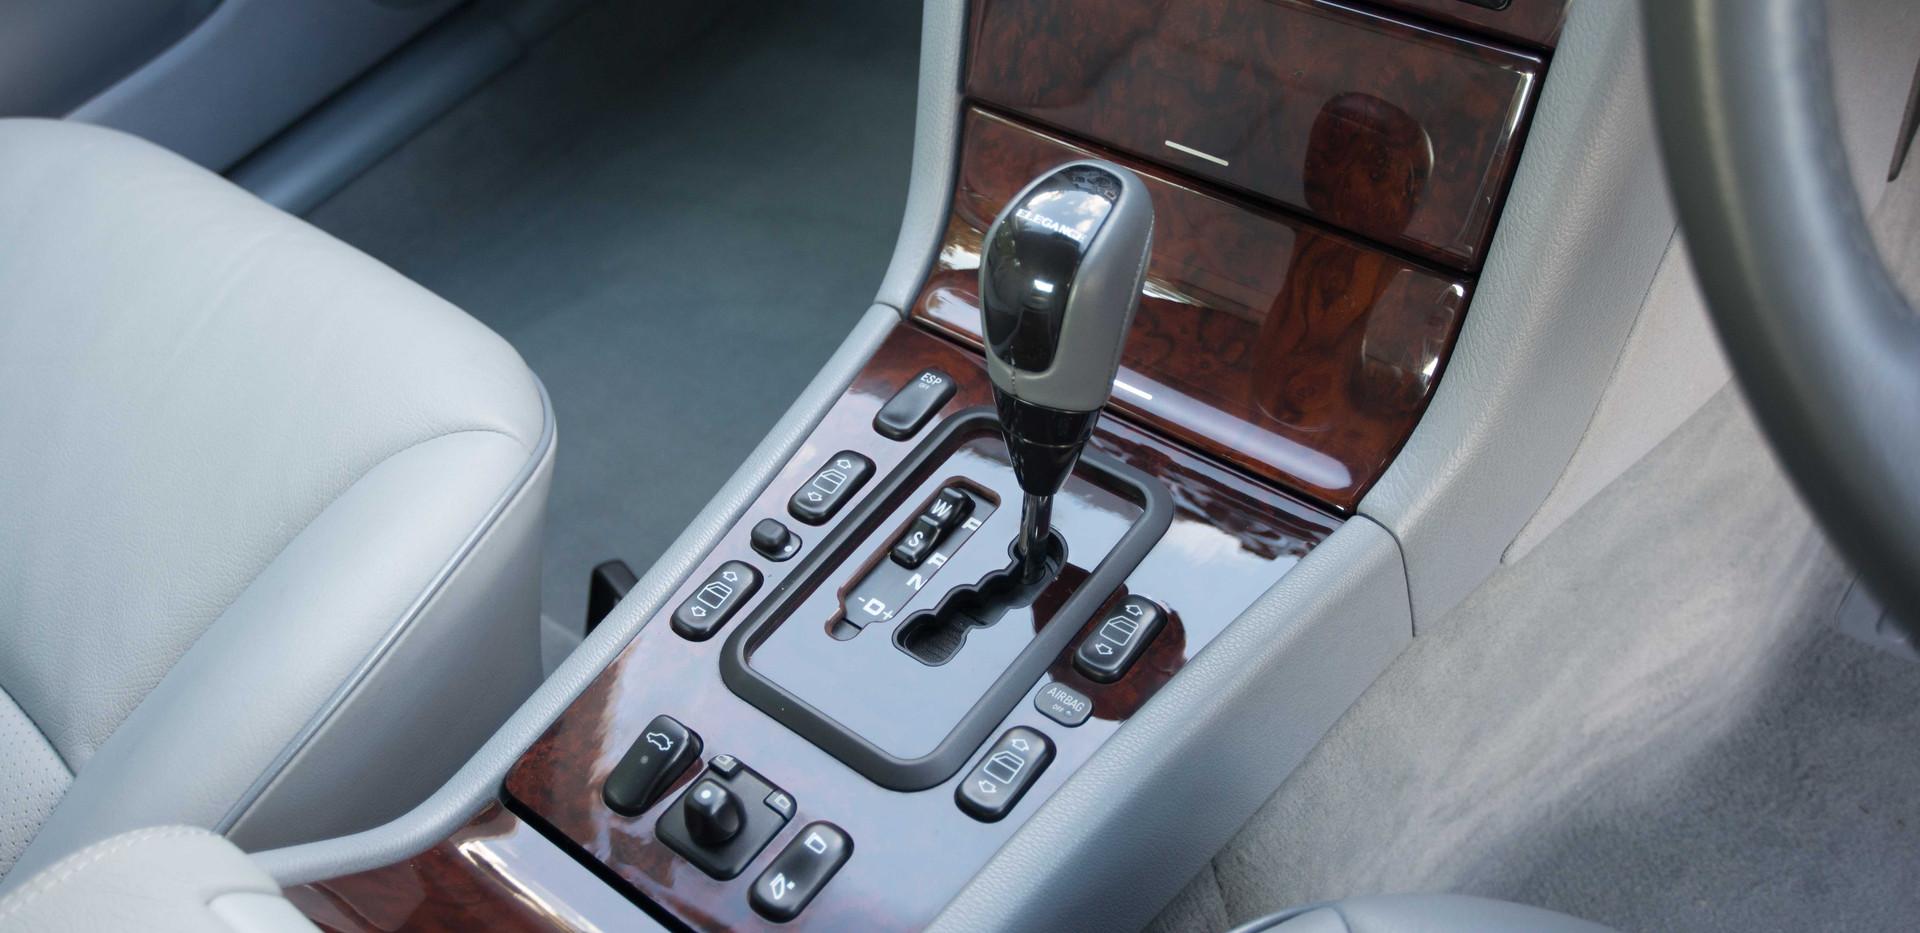 Mercedes E240 For Sale UK London  (58 of